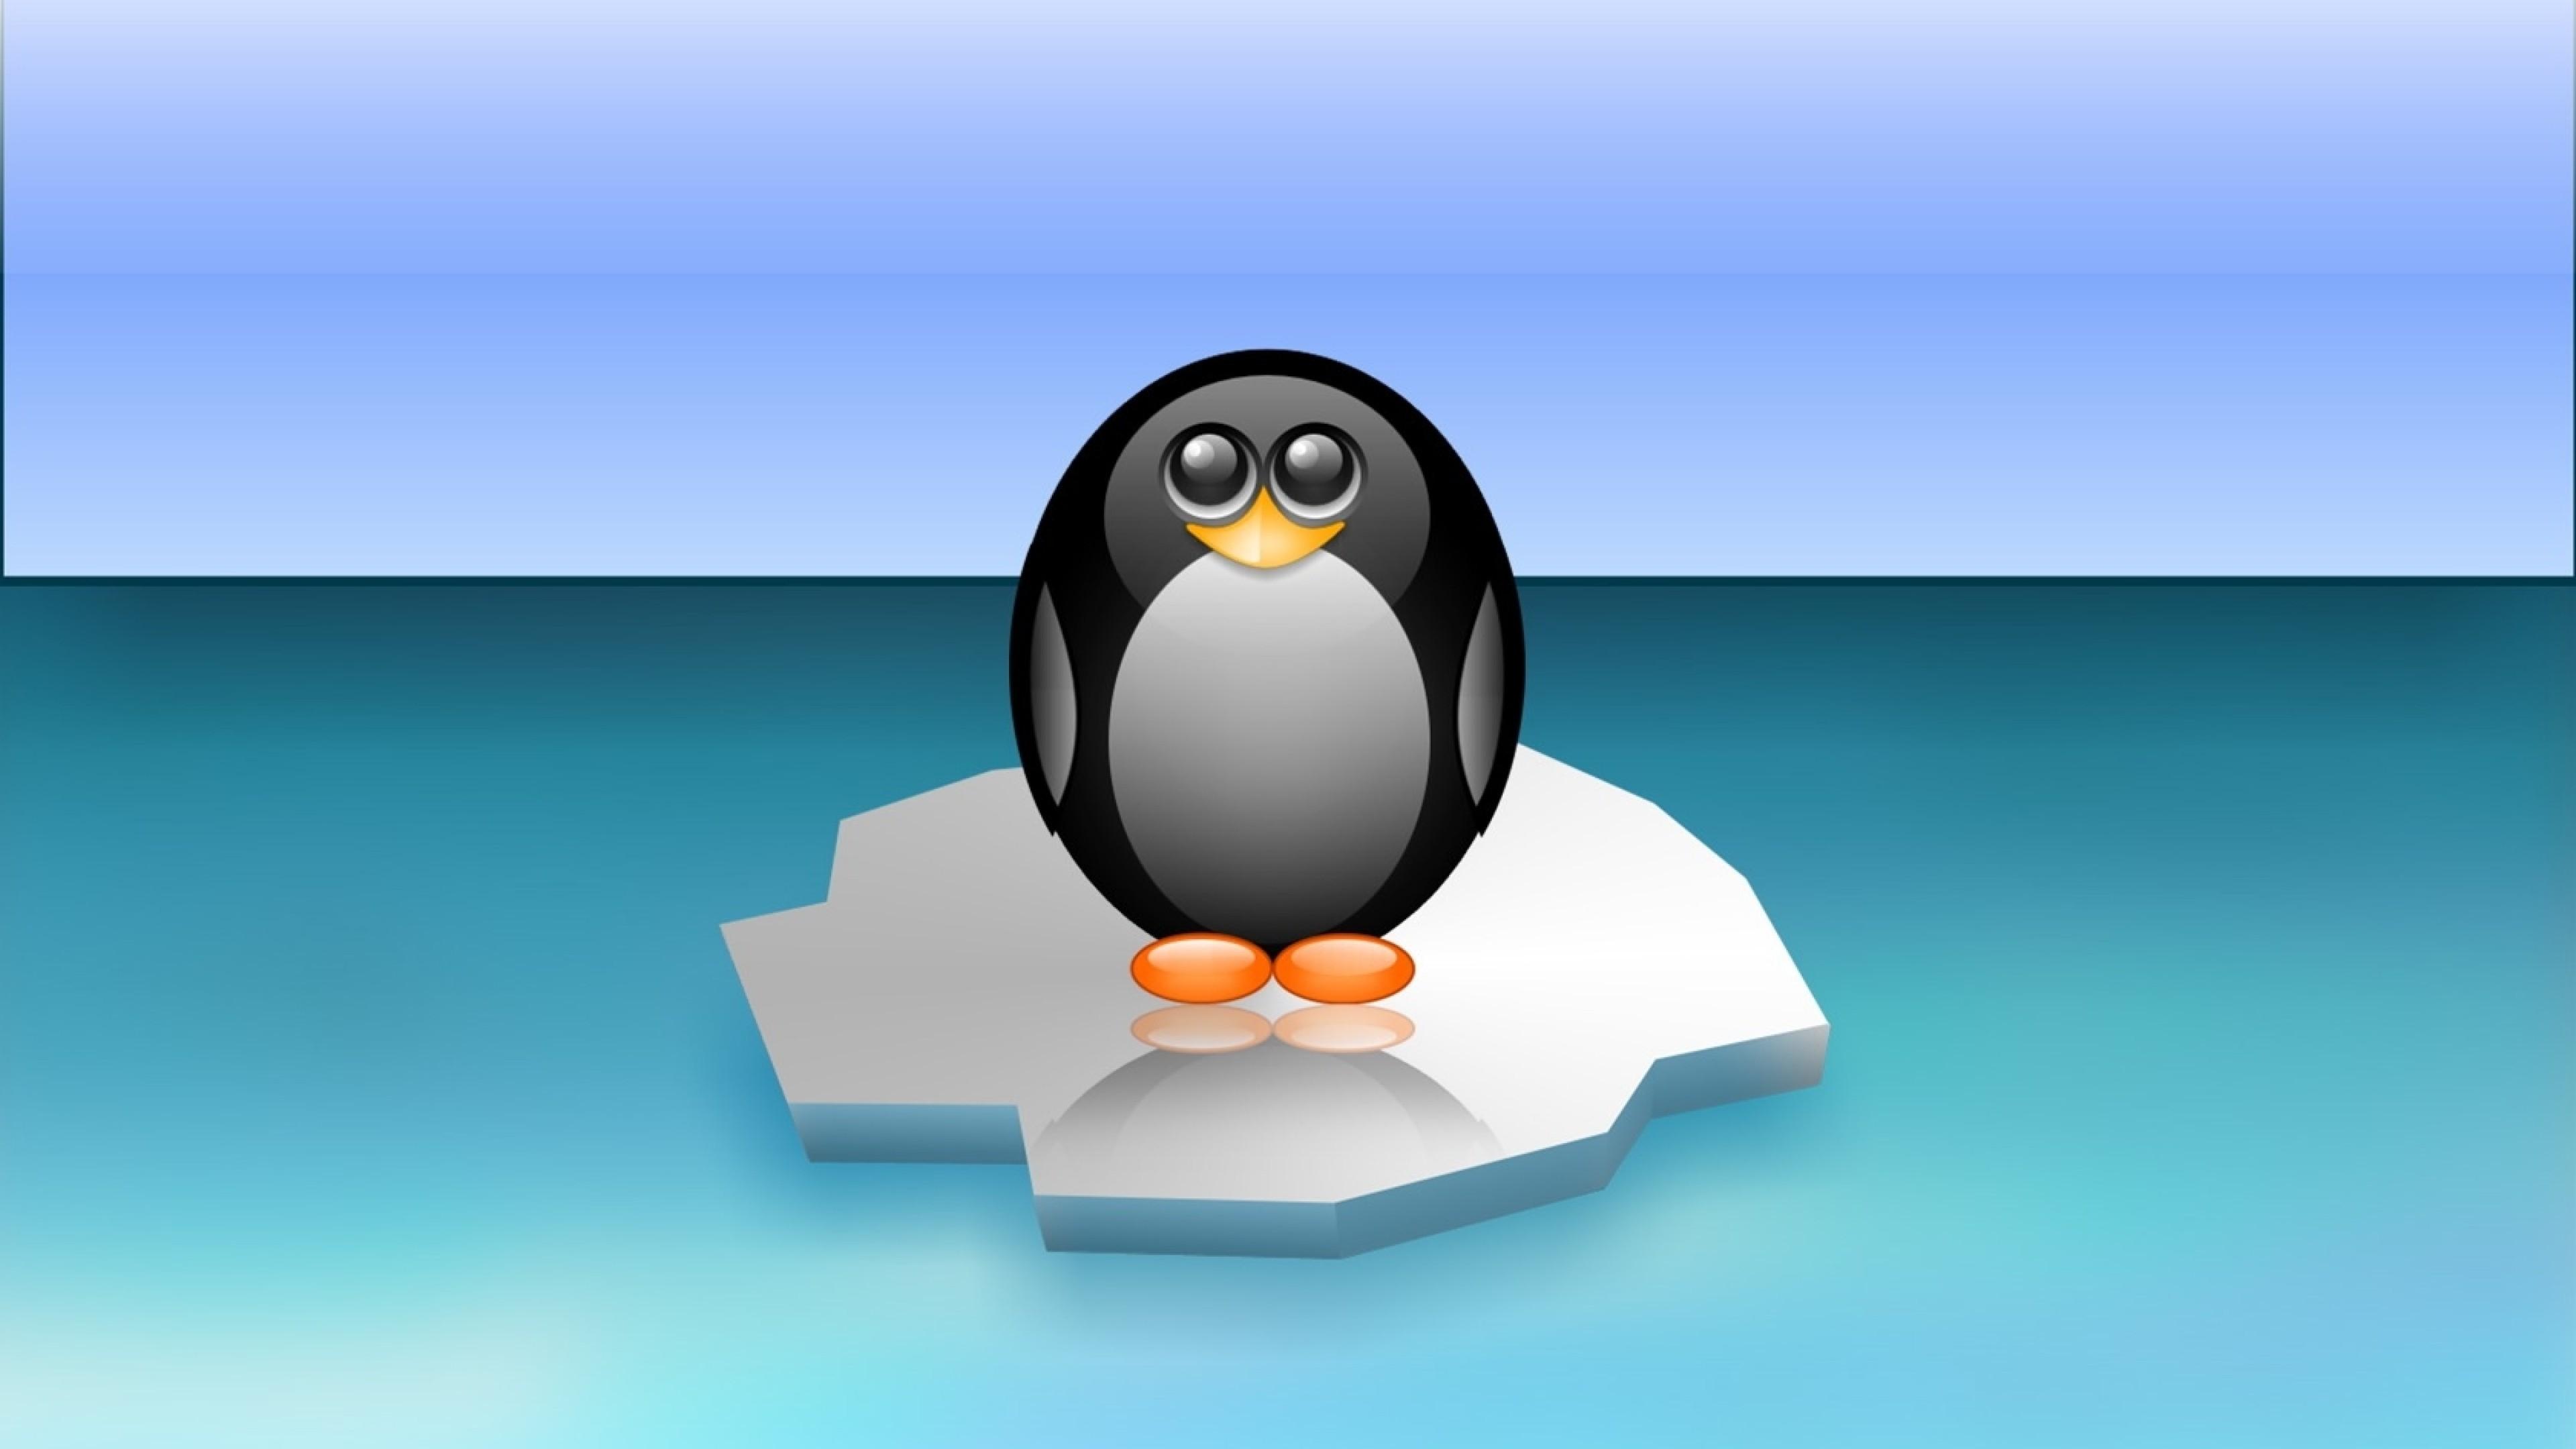 Funny And Cute Penguin Hd Wallpaper 4k Ultra Hd Hd